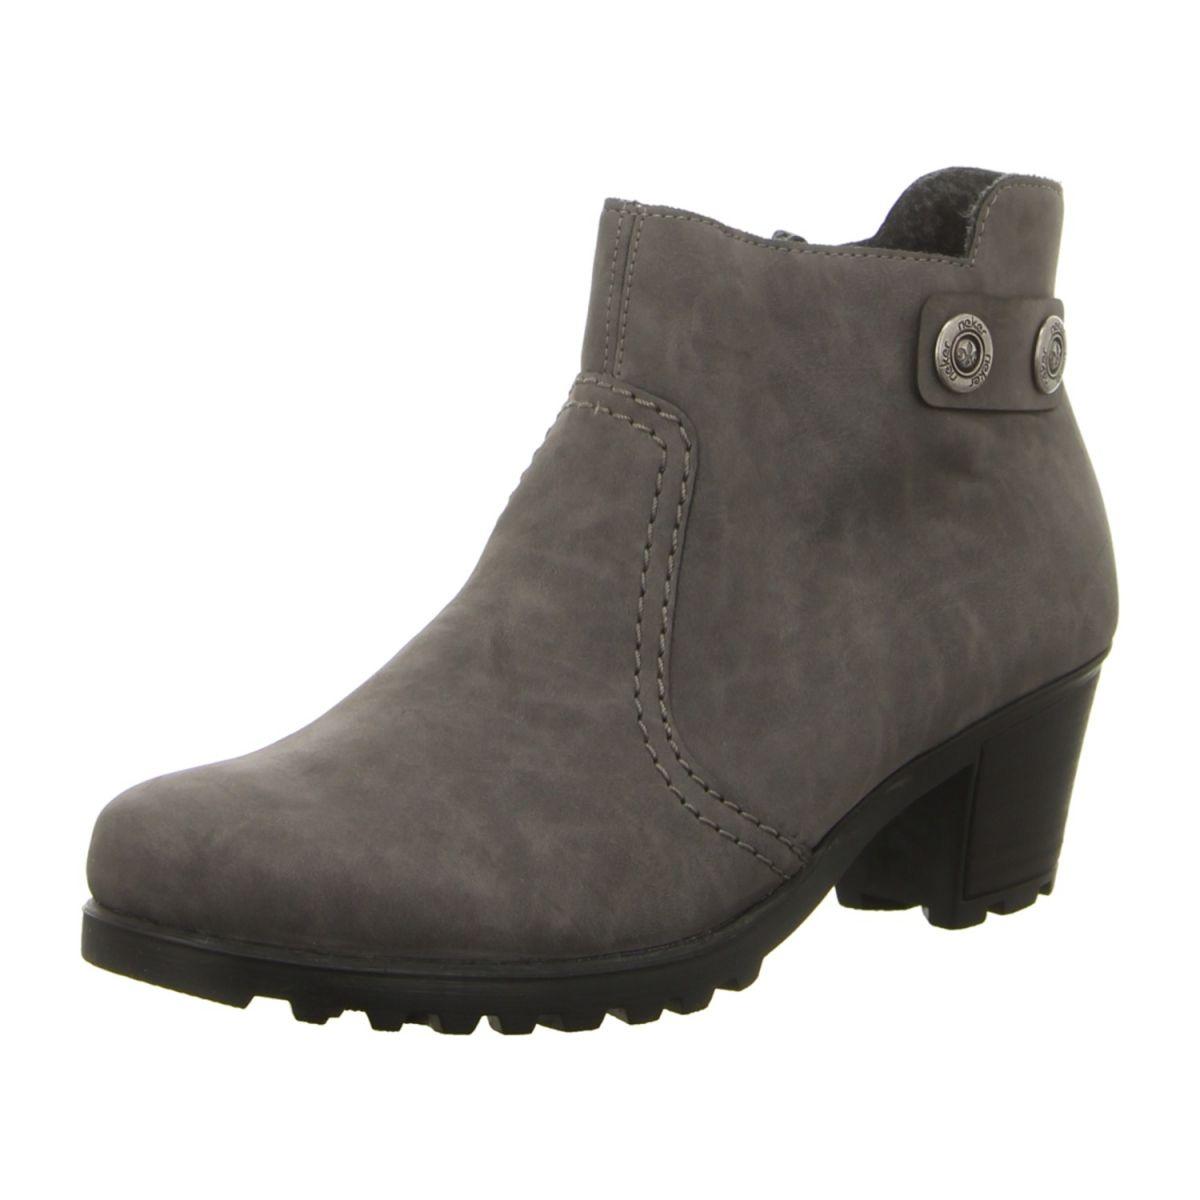 Rieker Schuhe Stiefelette Y8062-42 grau (grau) NEU